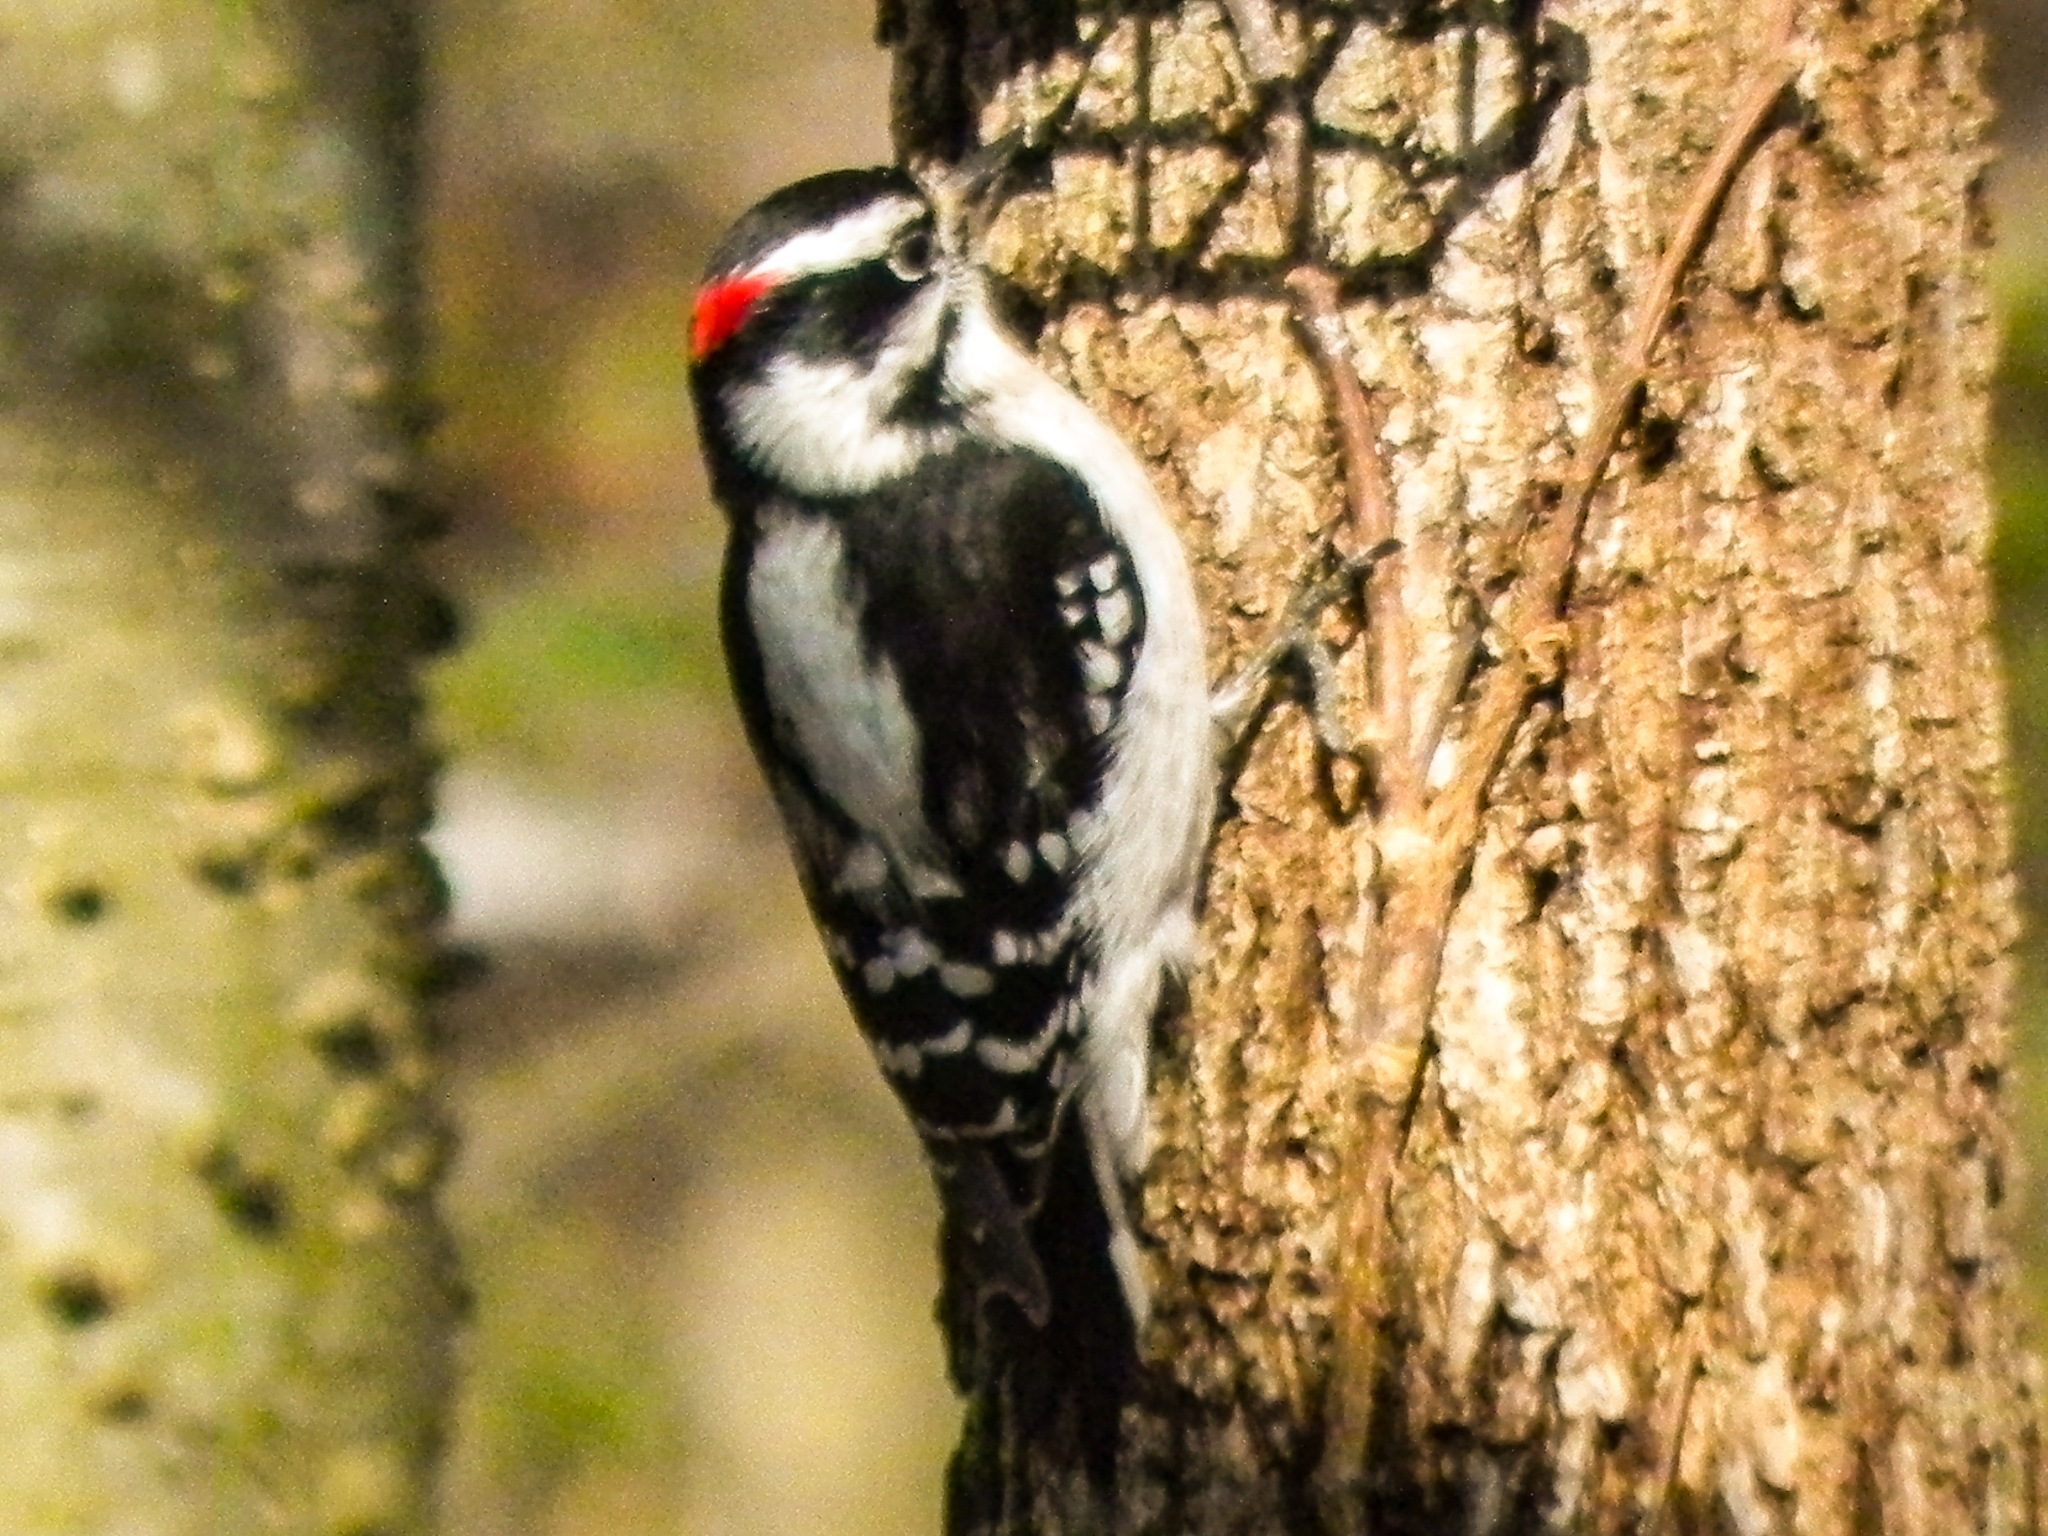 male downy woodpecker by amanda b.